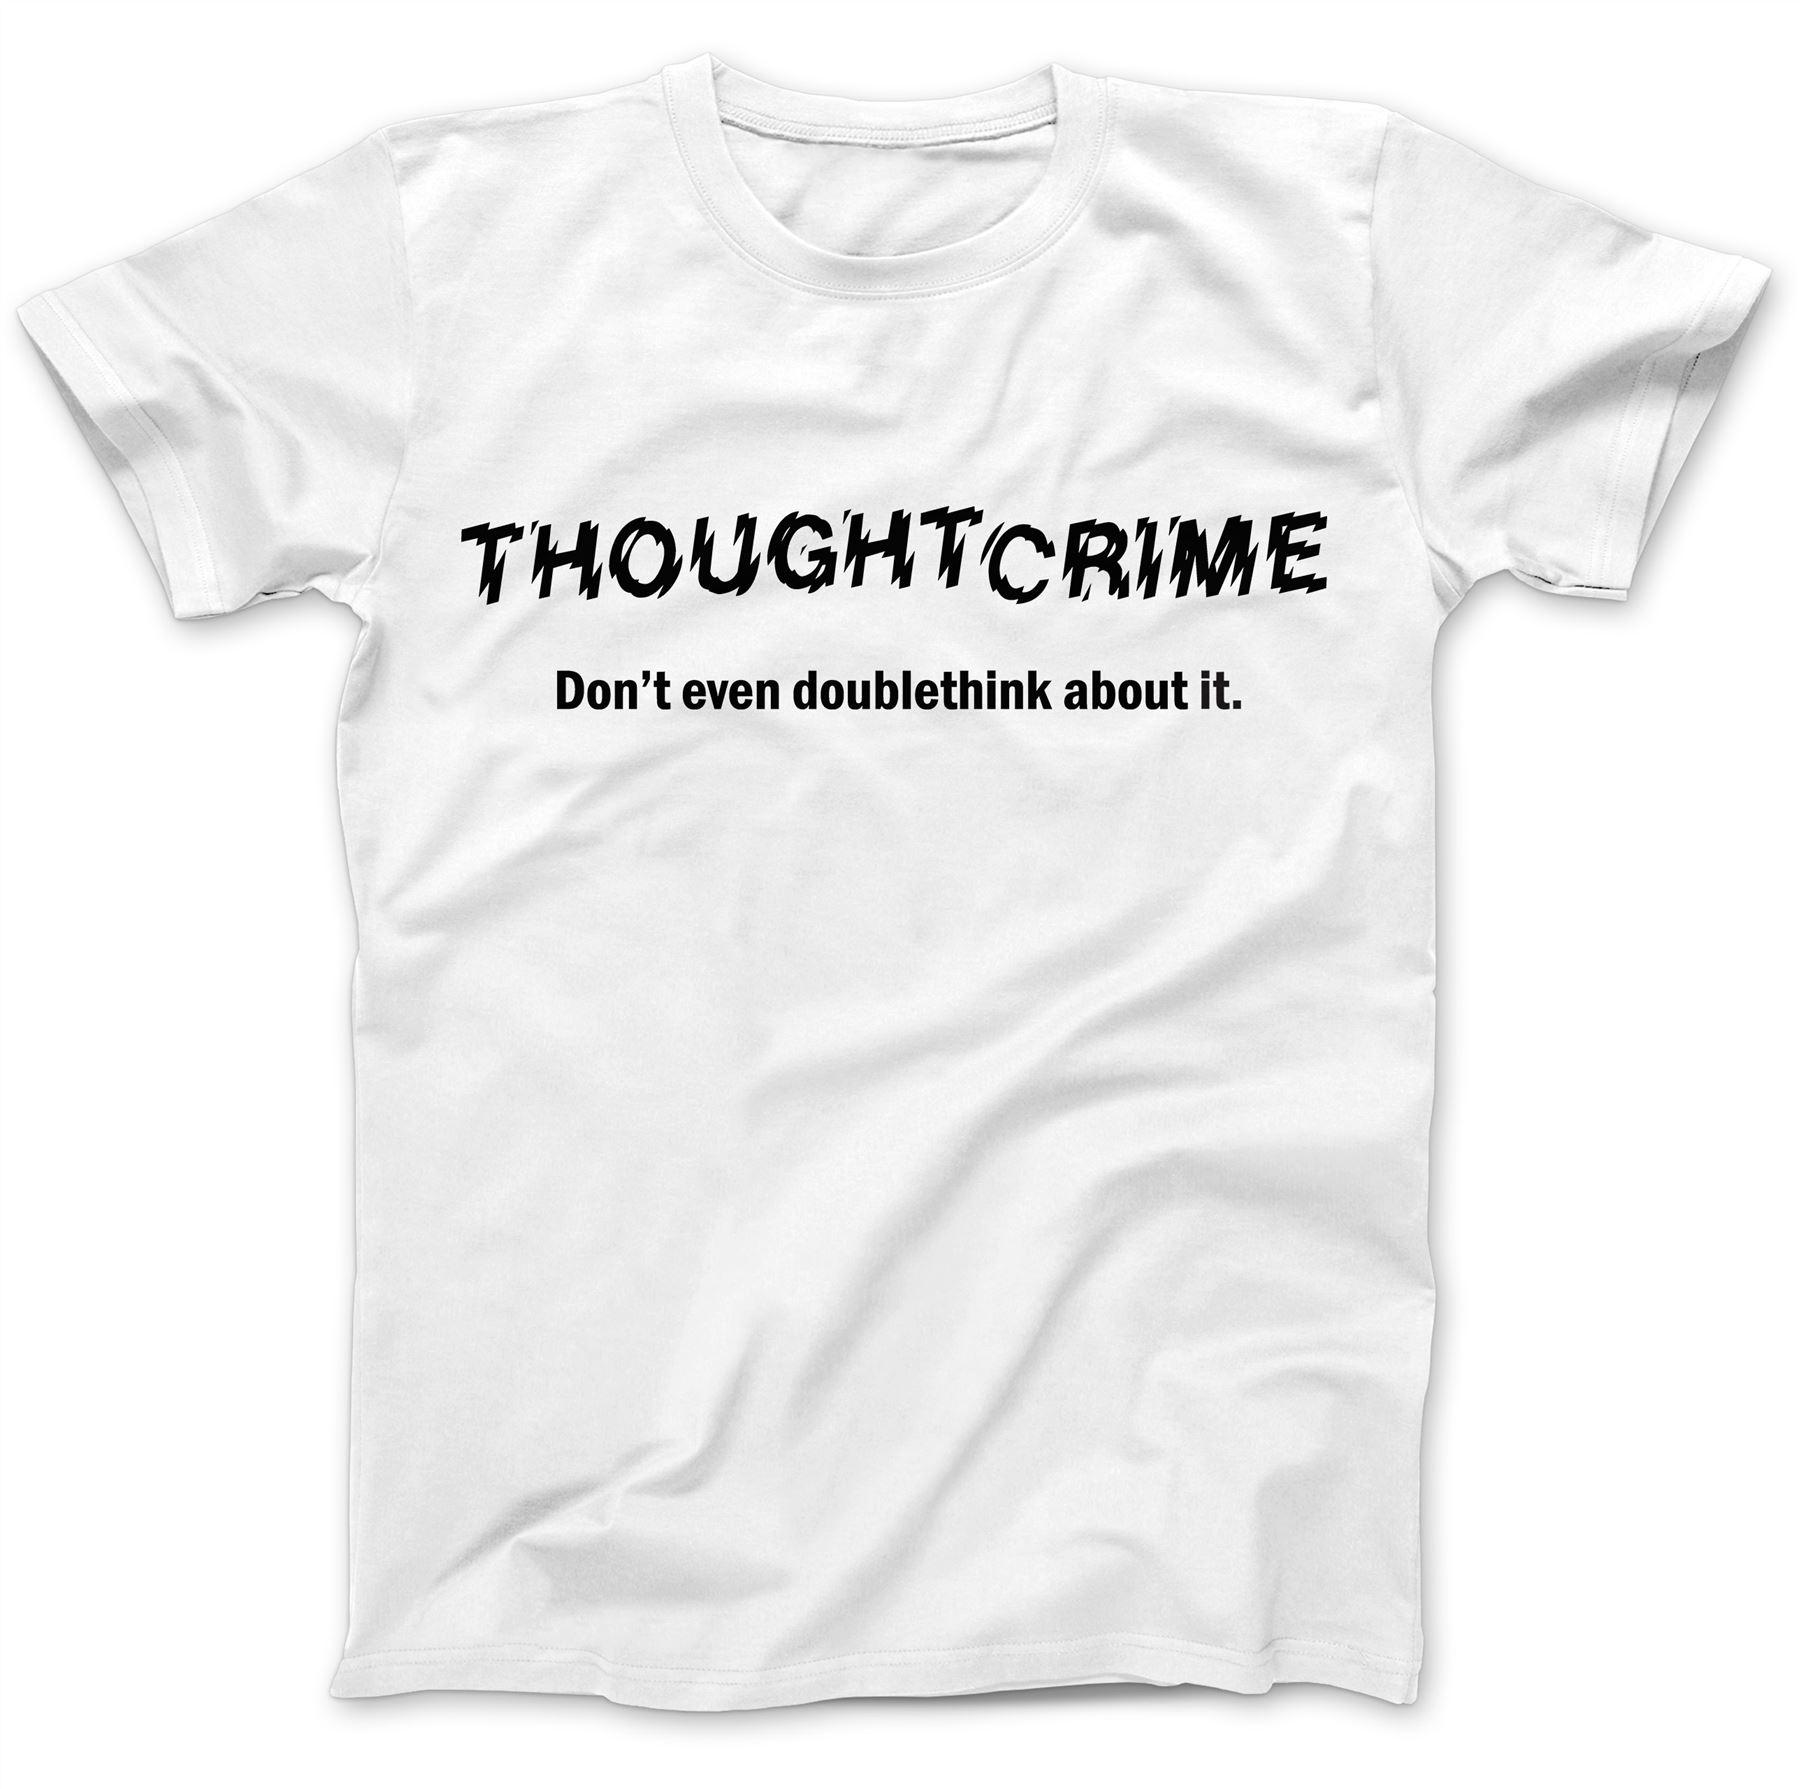 1984-Thought-Crime-George-Orwell-T-Shirt-100-Premium-Cotton-Animal-Farm miniatuur 23